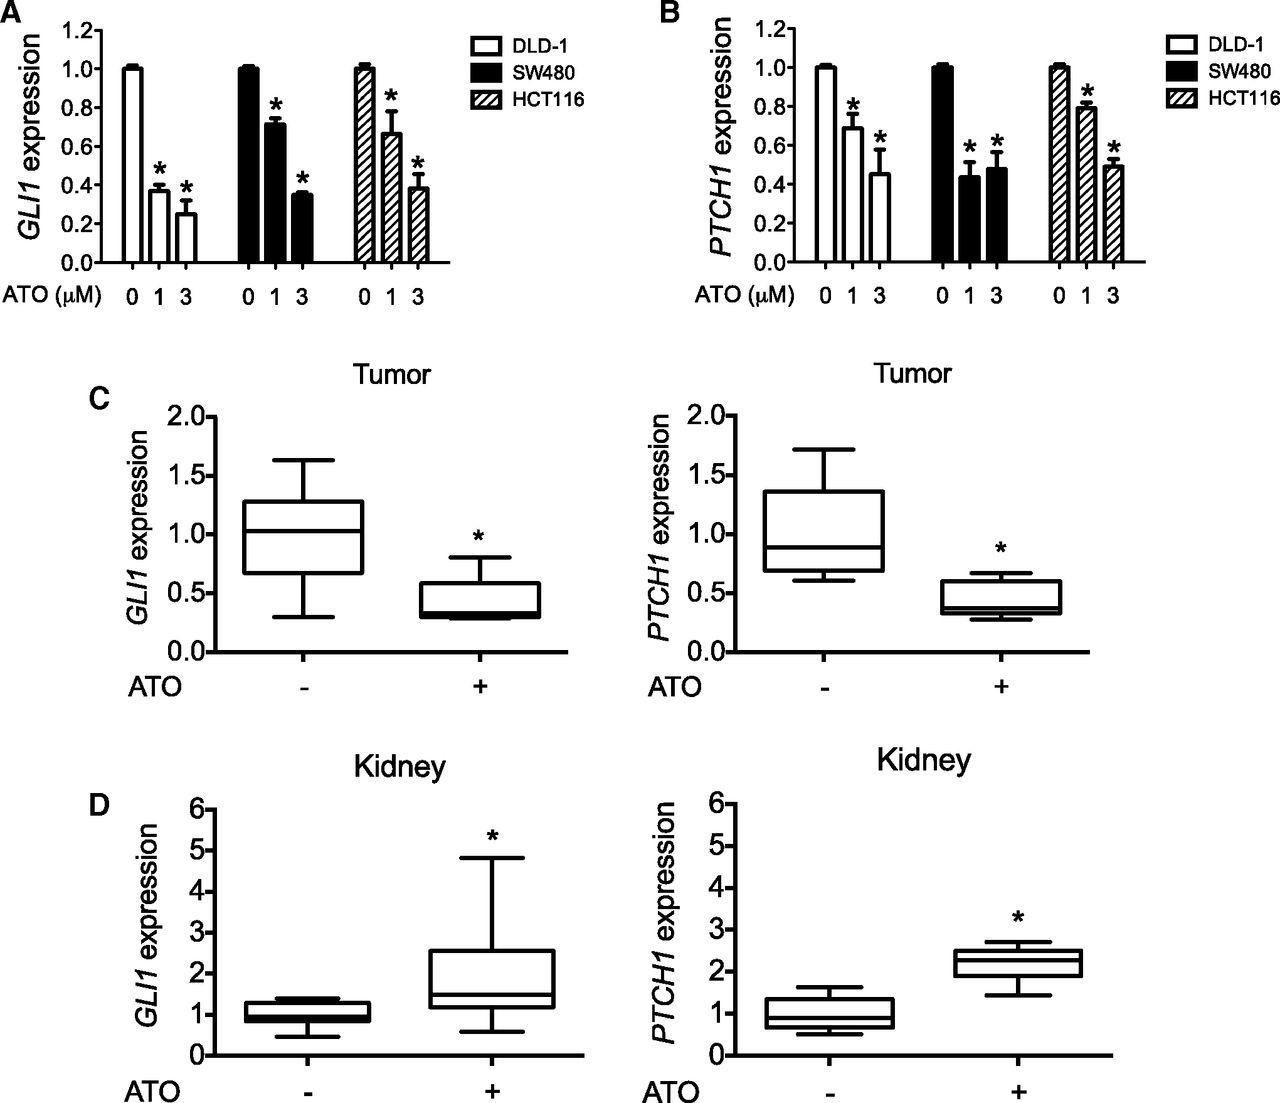 Arsenic Attenuates GLI Signaling, Increasing or Decreasing